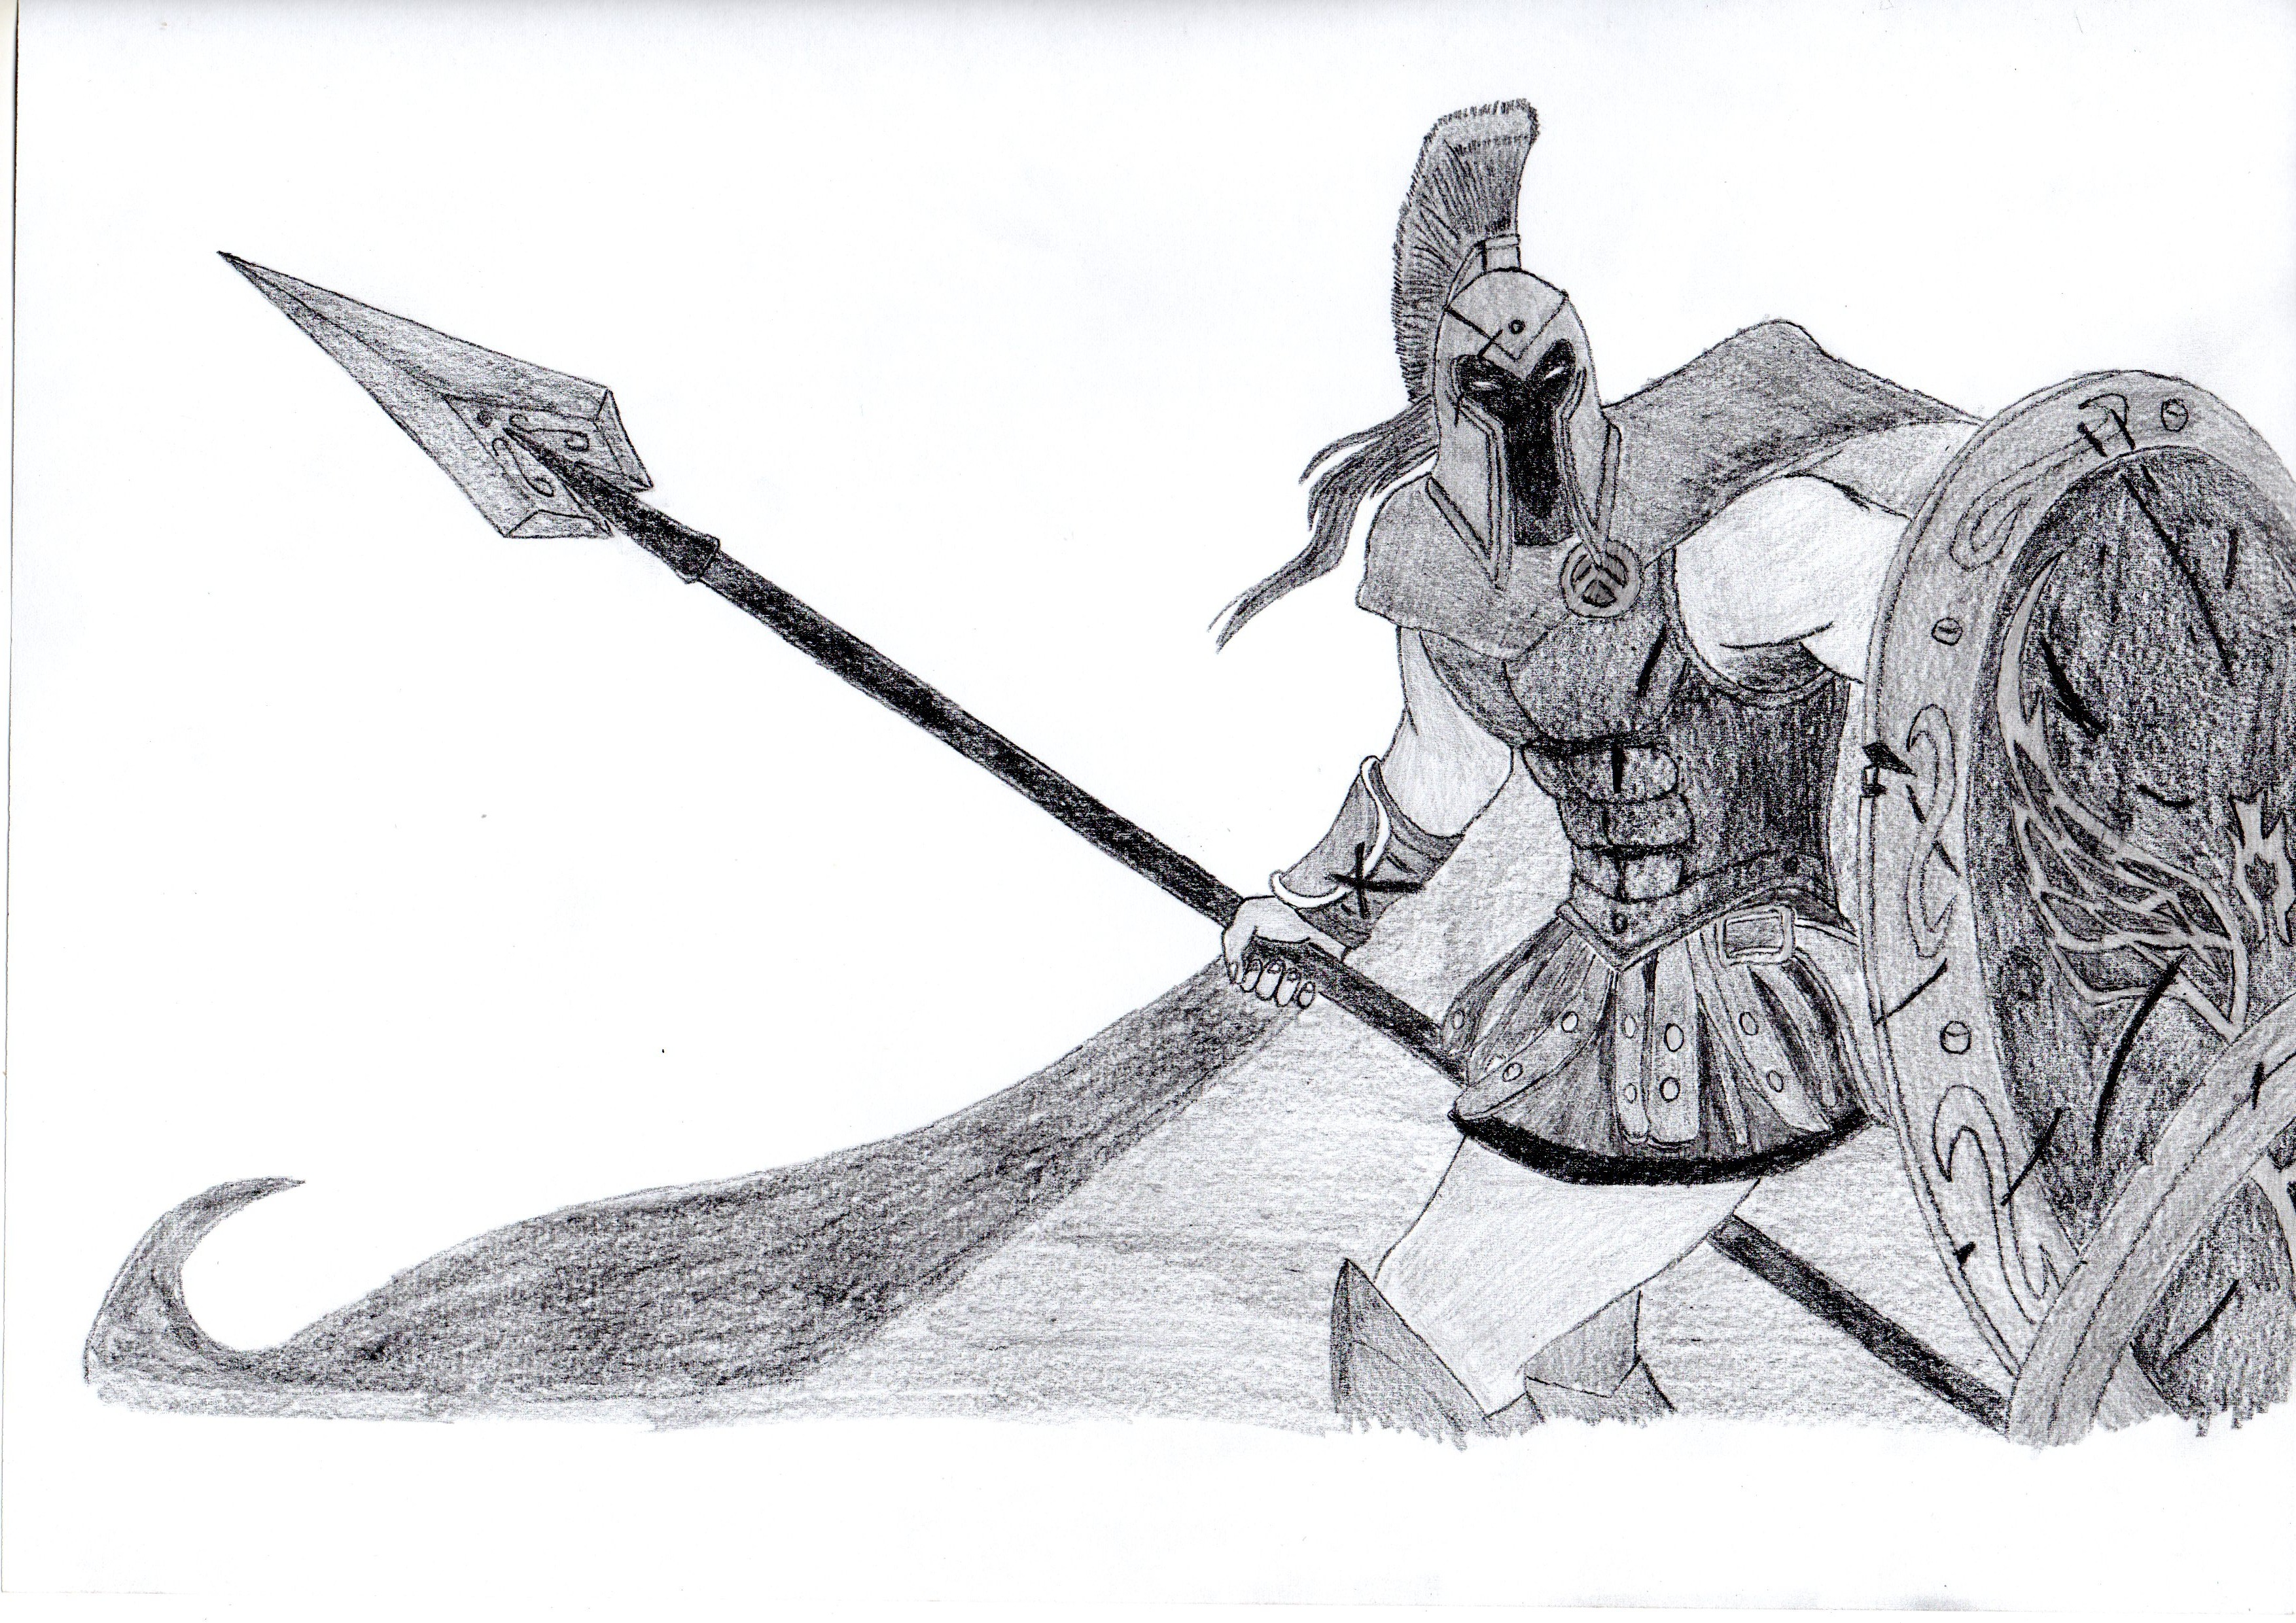 Line Art Xl 2012 : Pantheon the artisan of war by origamisxl on deviantart